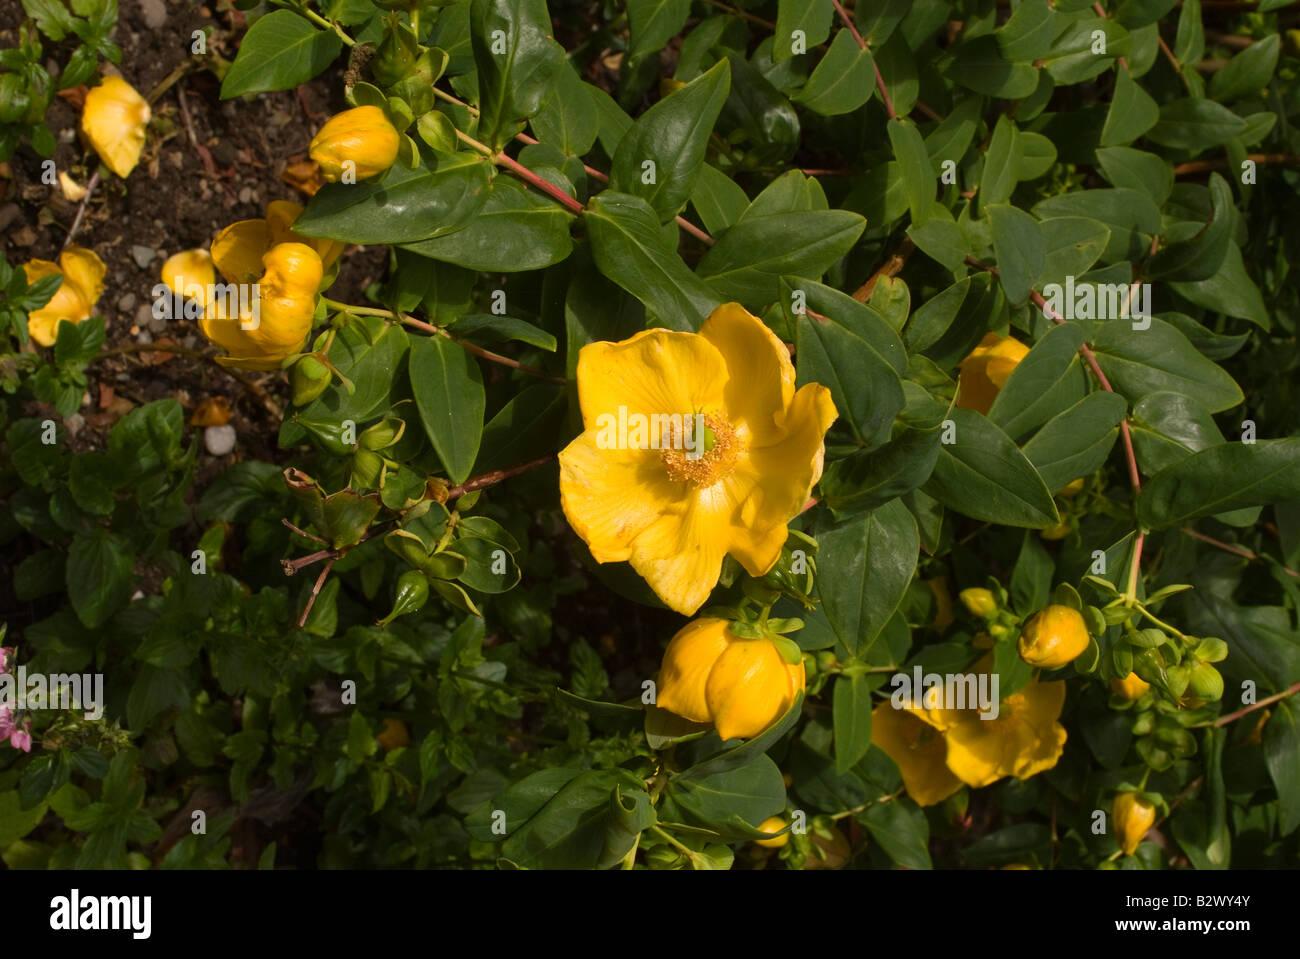 Yellow flowers of hypericum rowallane shrub in logan botanic stock photo yellow flowers of hypericum rowallane shrub in logan botanic garden dumfries and galloway scotland united kingdom dhlflorist Gallery